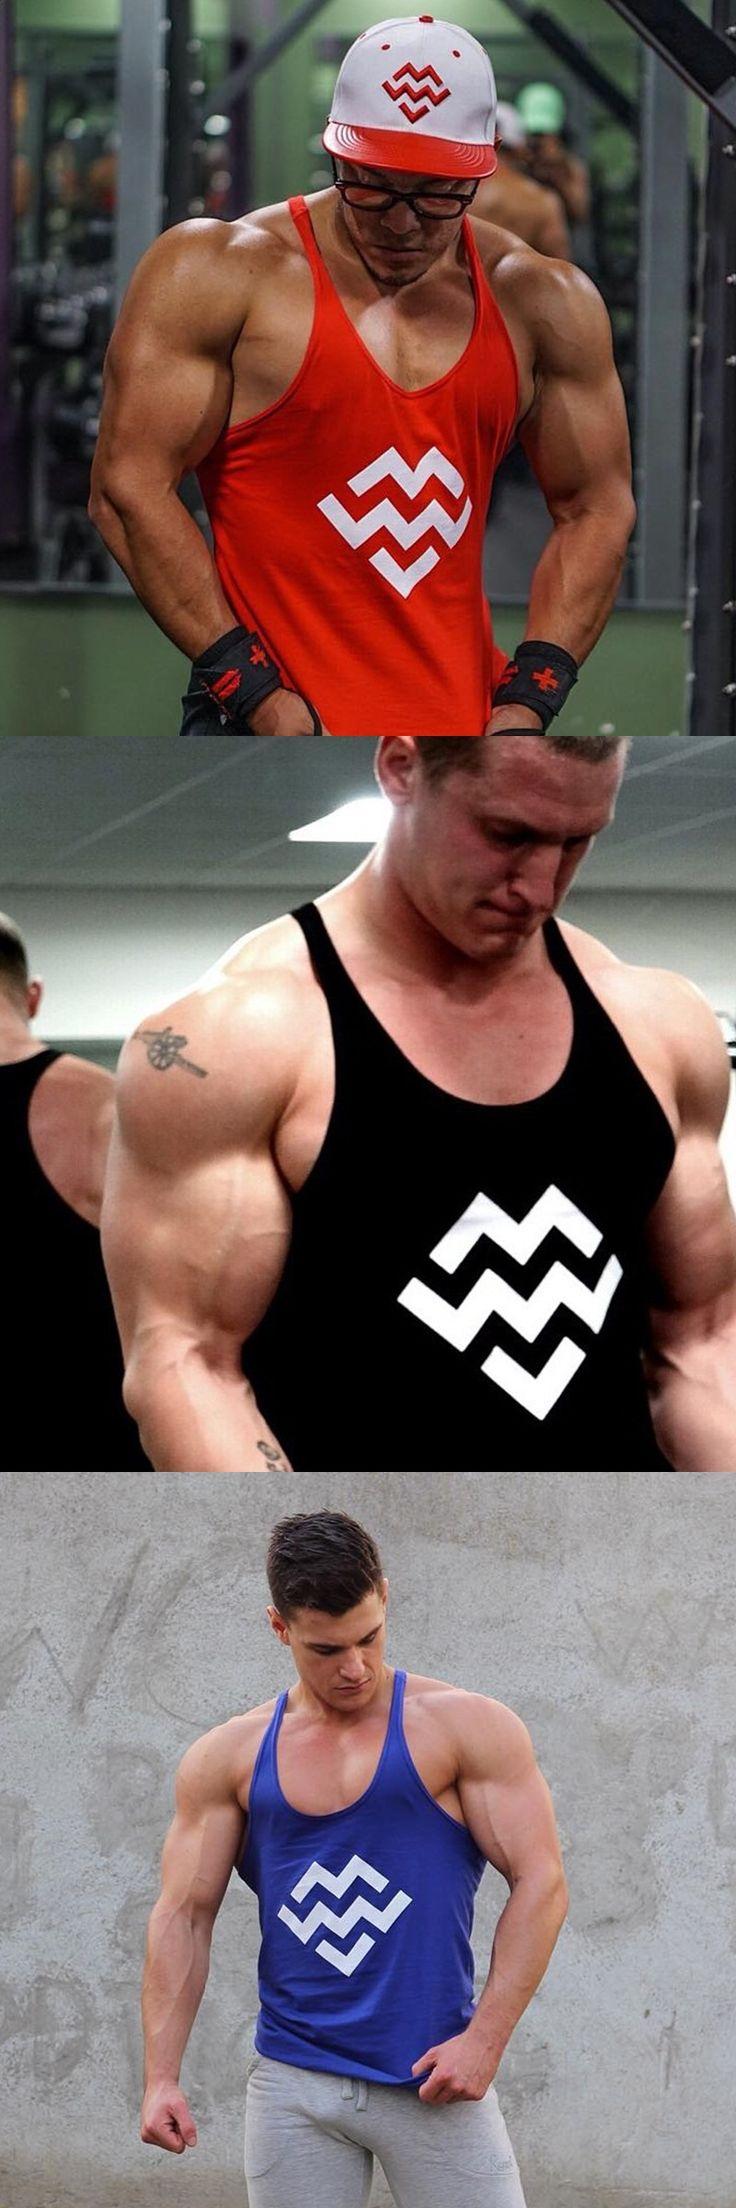 Men Bodybuilding Tank Tops Gyms Muscle Stringer Singlets Fittnes Vest Shirt  Fitness Sleeveless t shirt Hip hop Fashion Vest Top